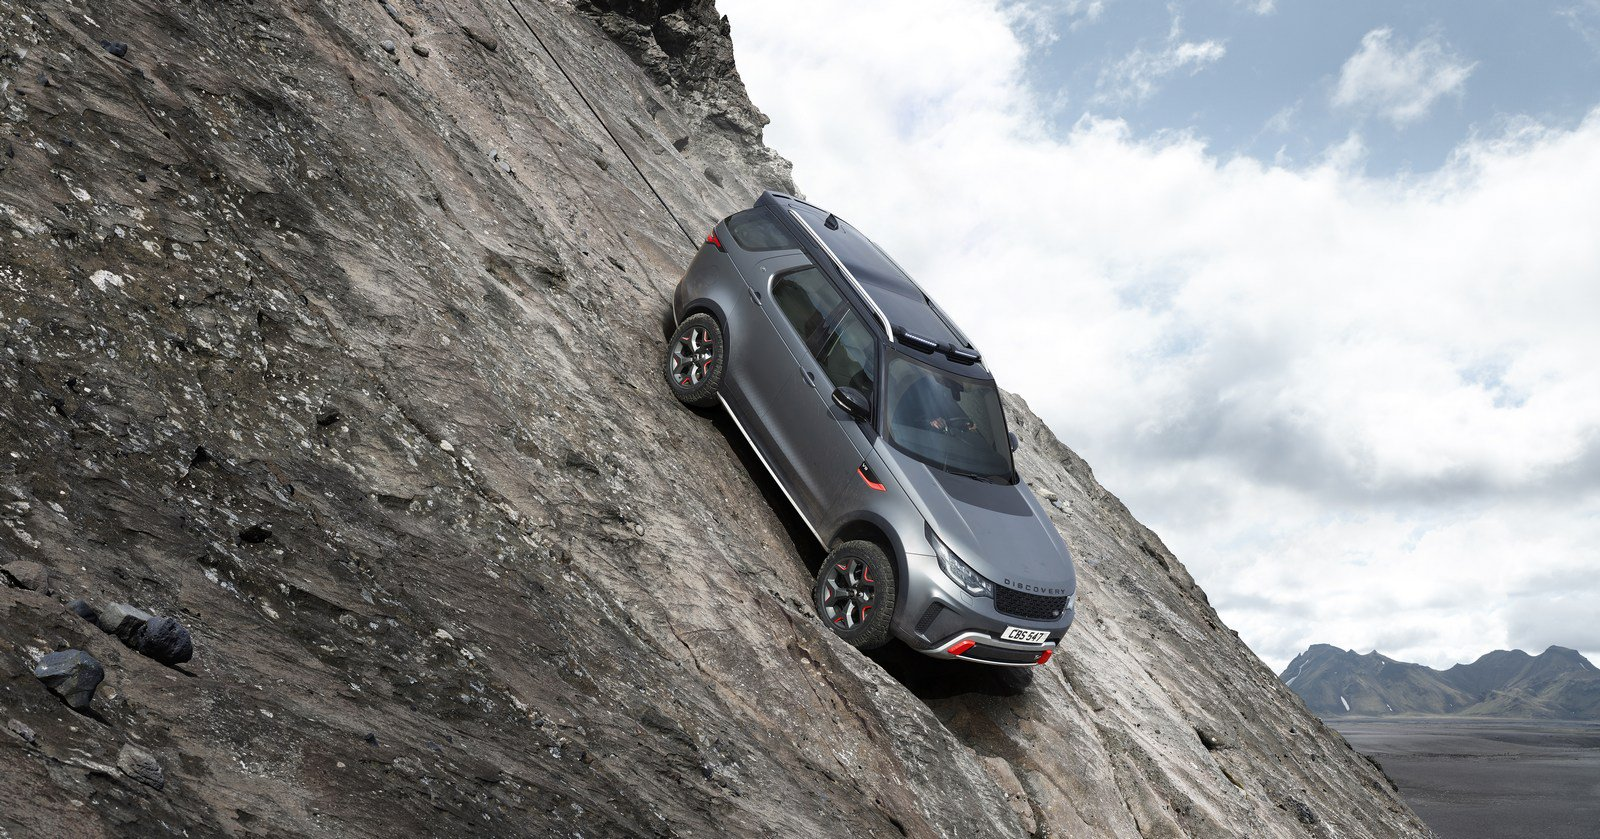 ¡Cancelado! El Land Rover Discovery SVX no llegará finalmente a producción